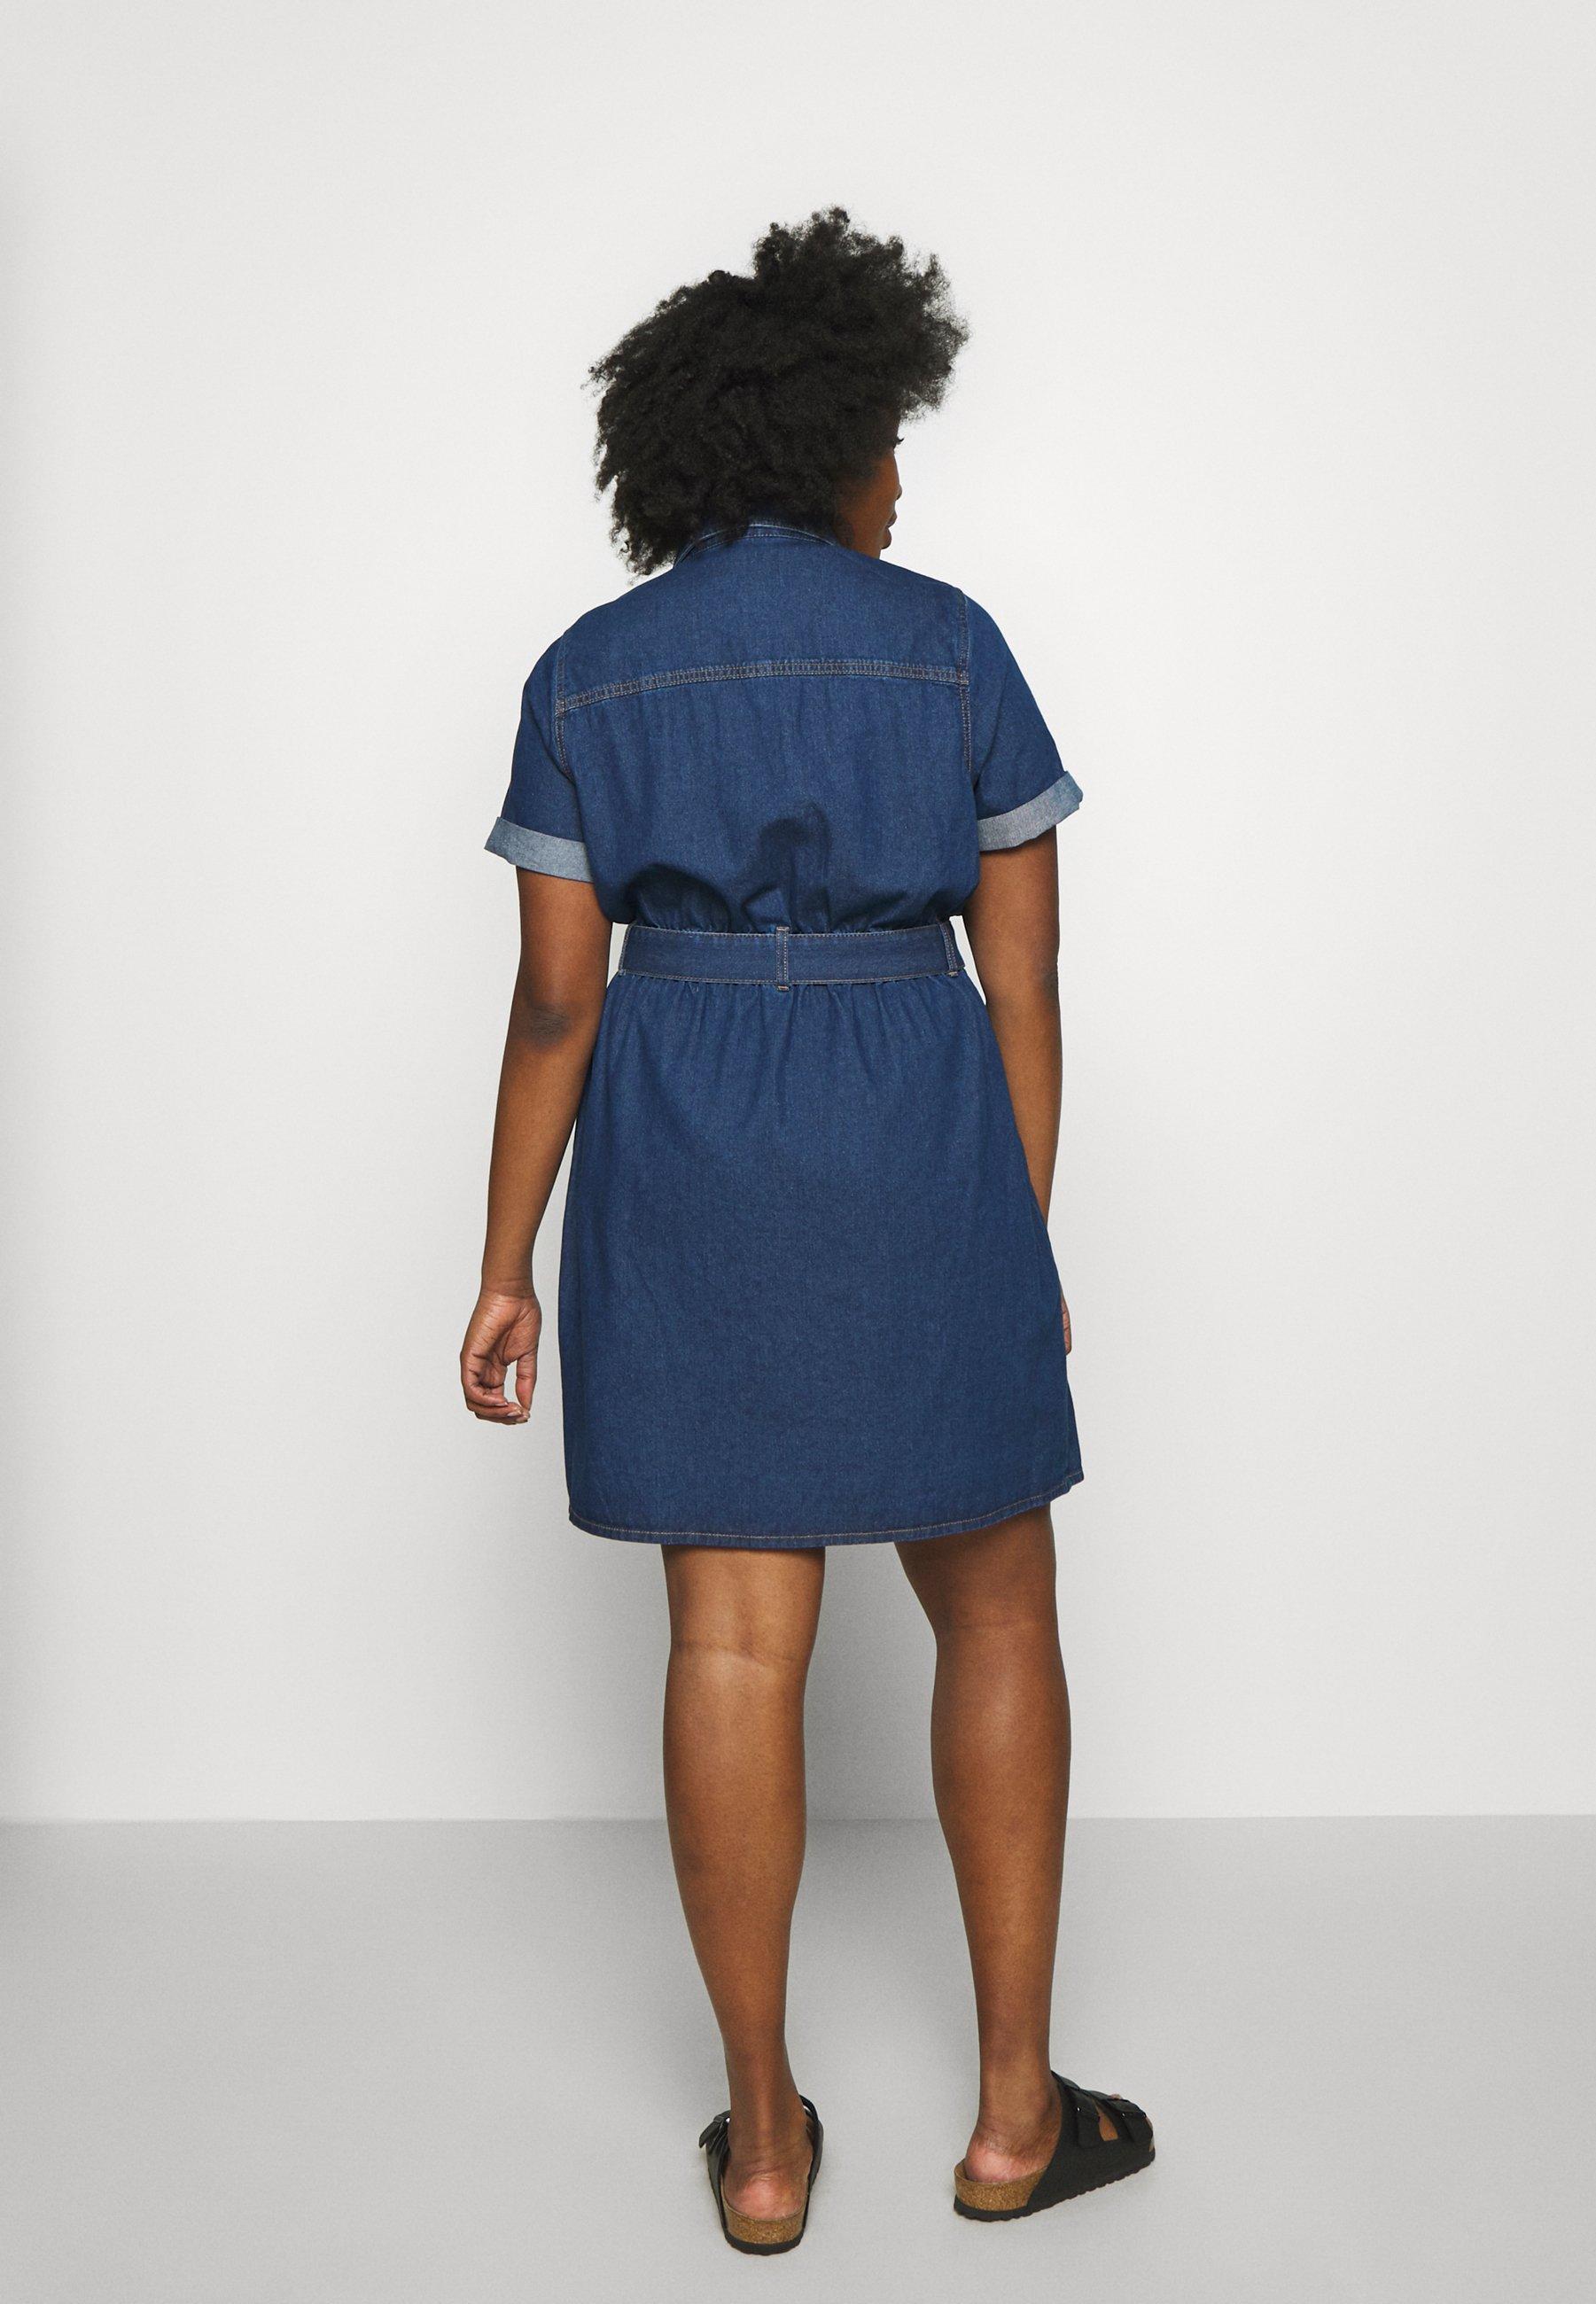 New Look Curves Utility Dress - Jeanskjole / Cowboykjoler Indigo Blue